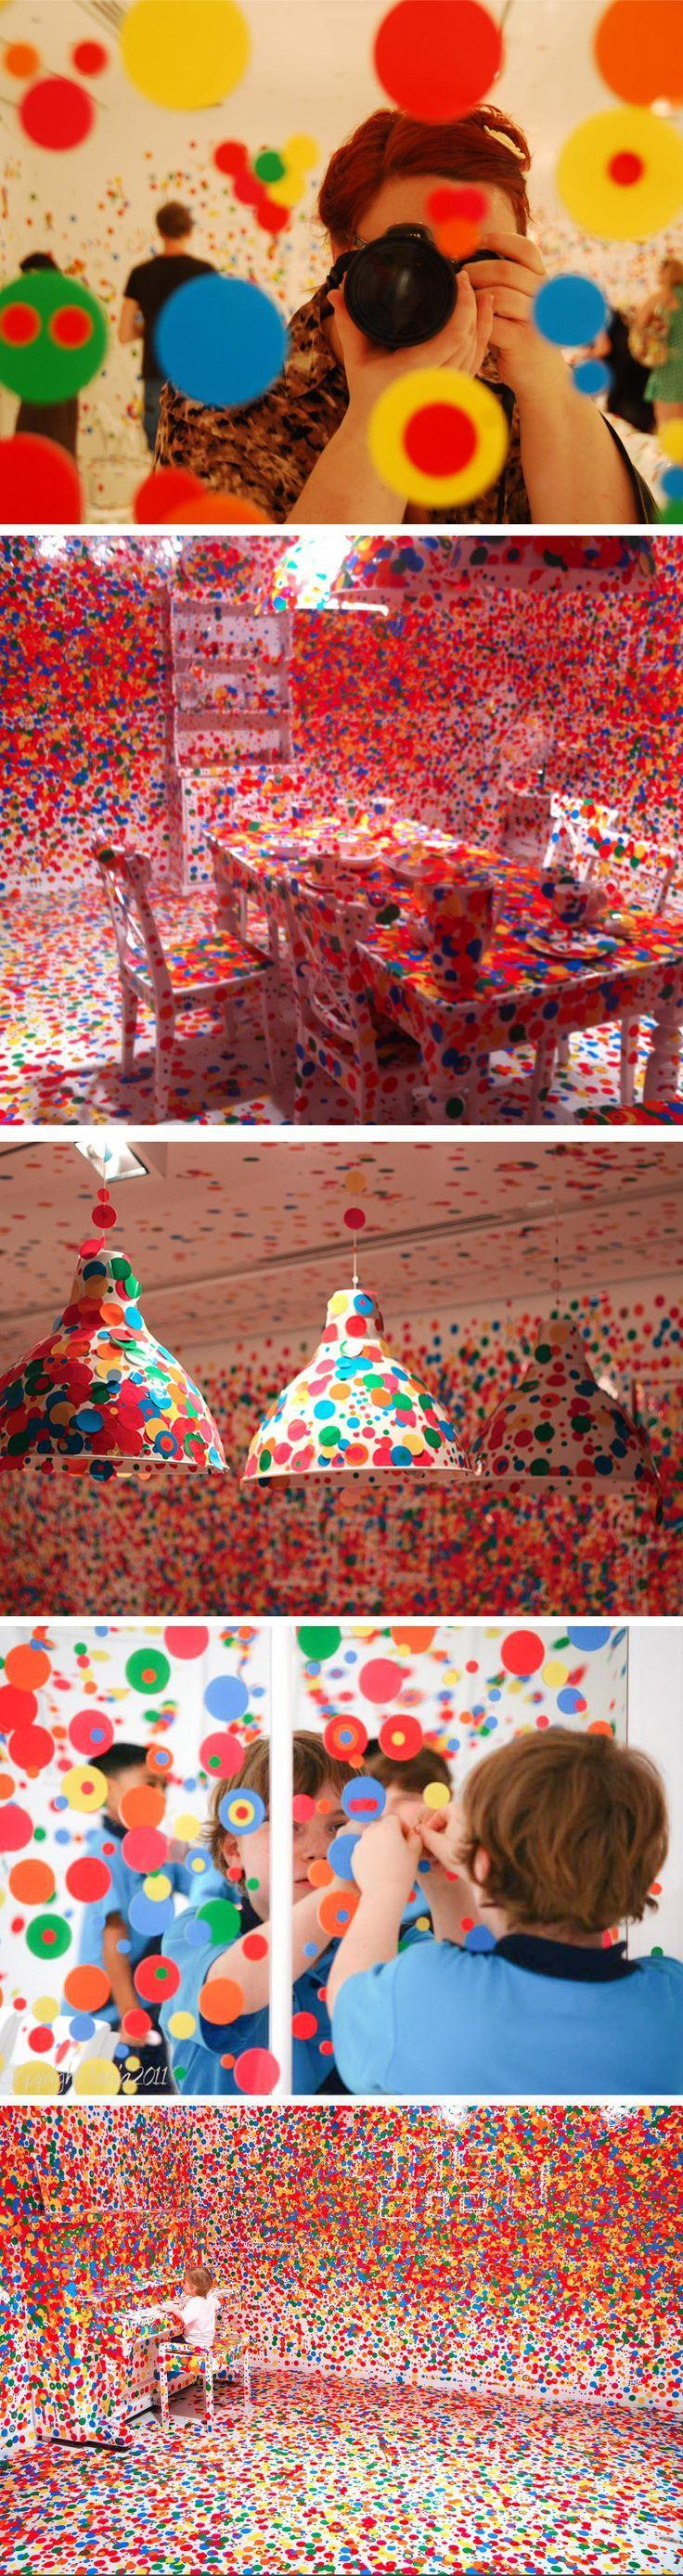 Yayoi Kusama. Obliteration Room. Interactive art piece. Super cool.